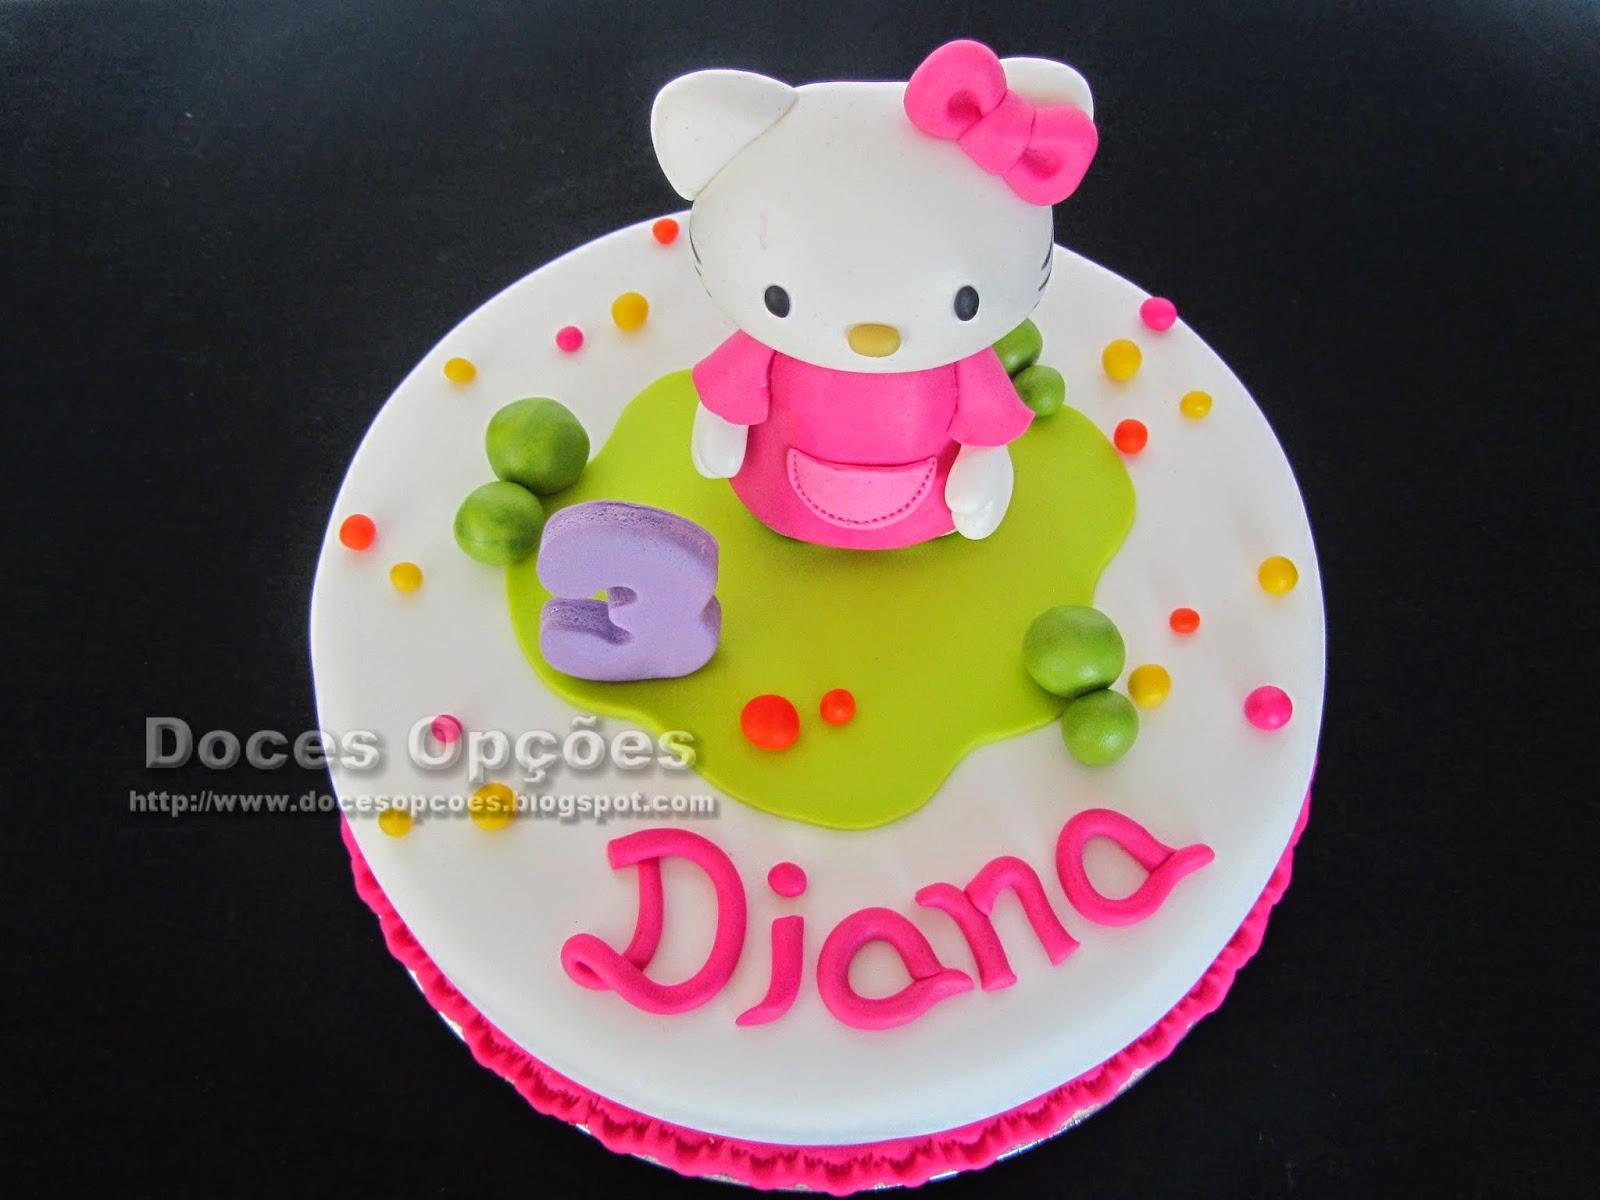 bolo kitty bragança doces opções